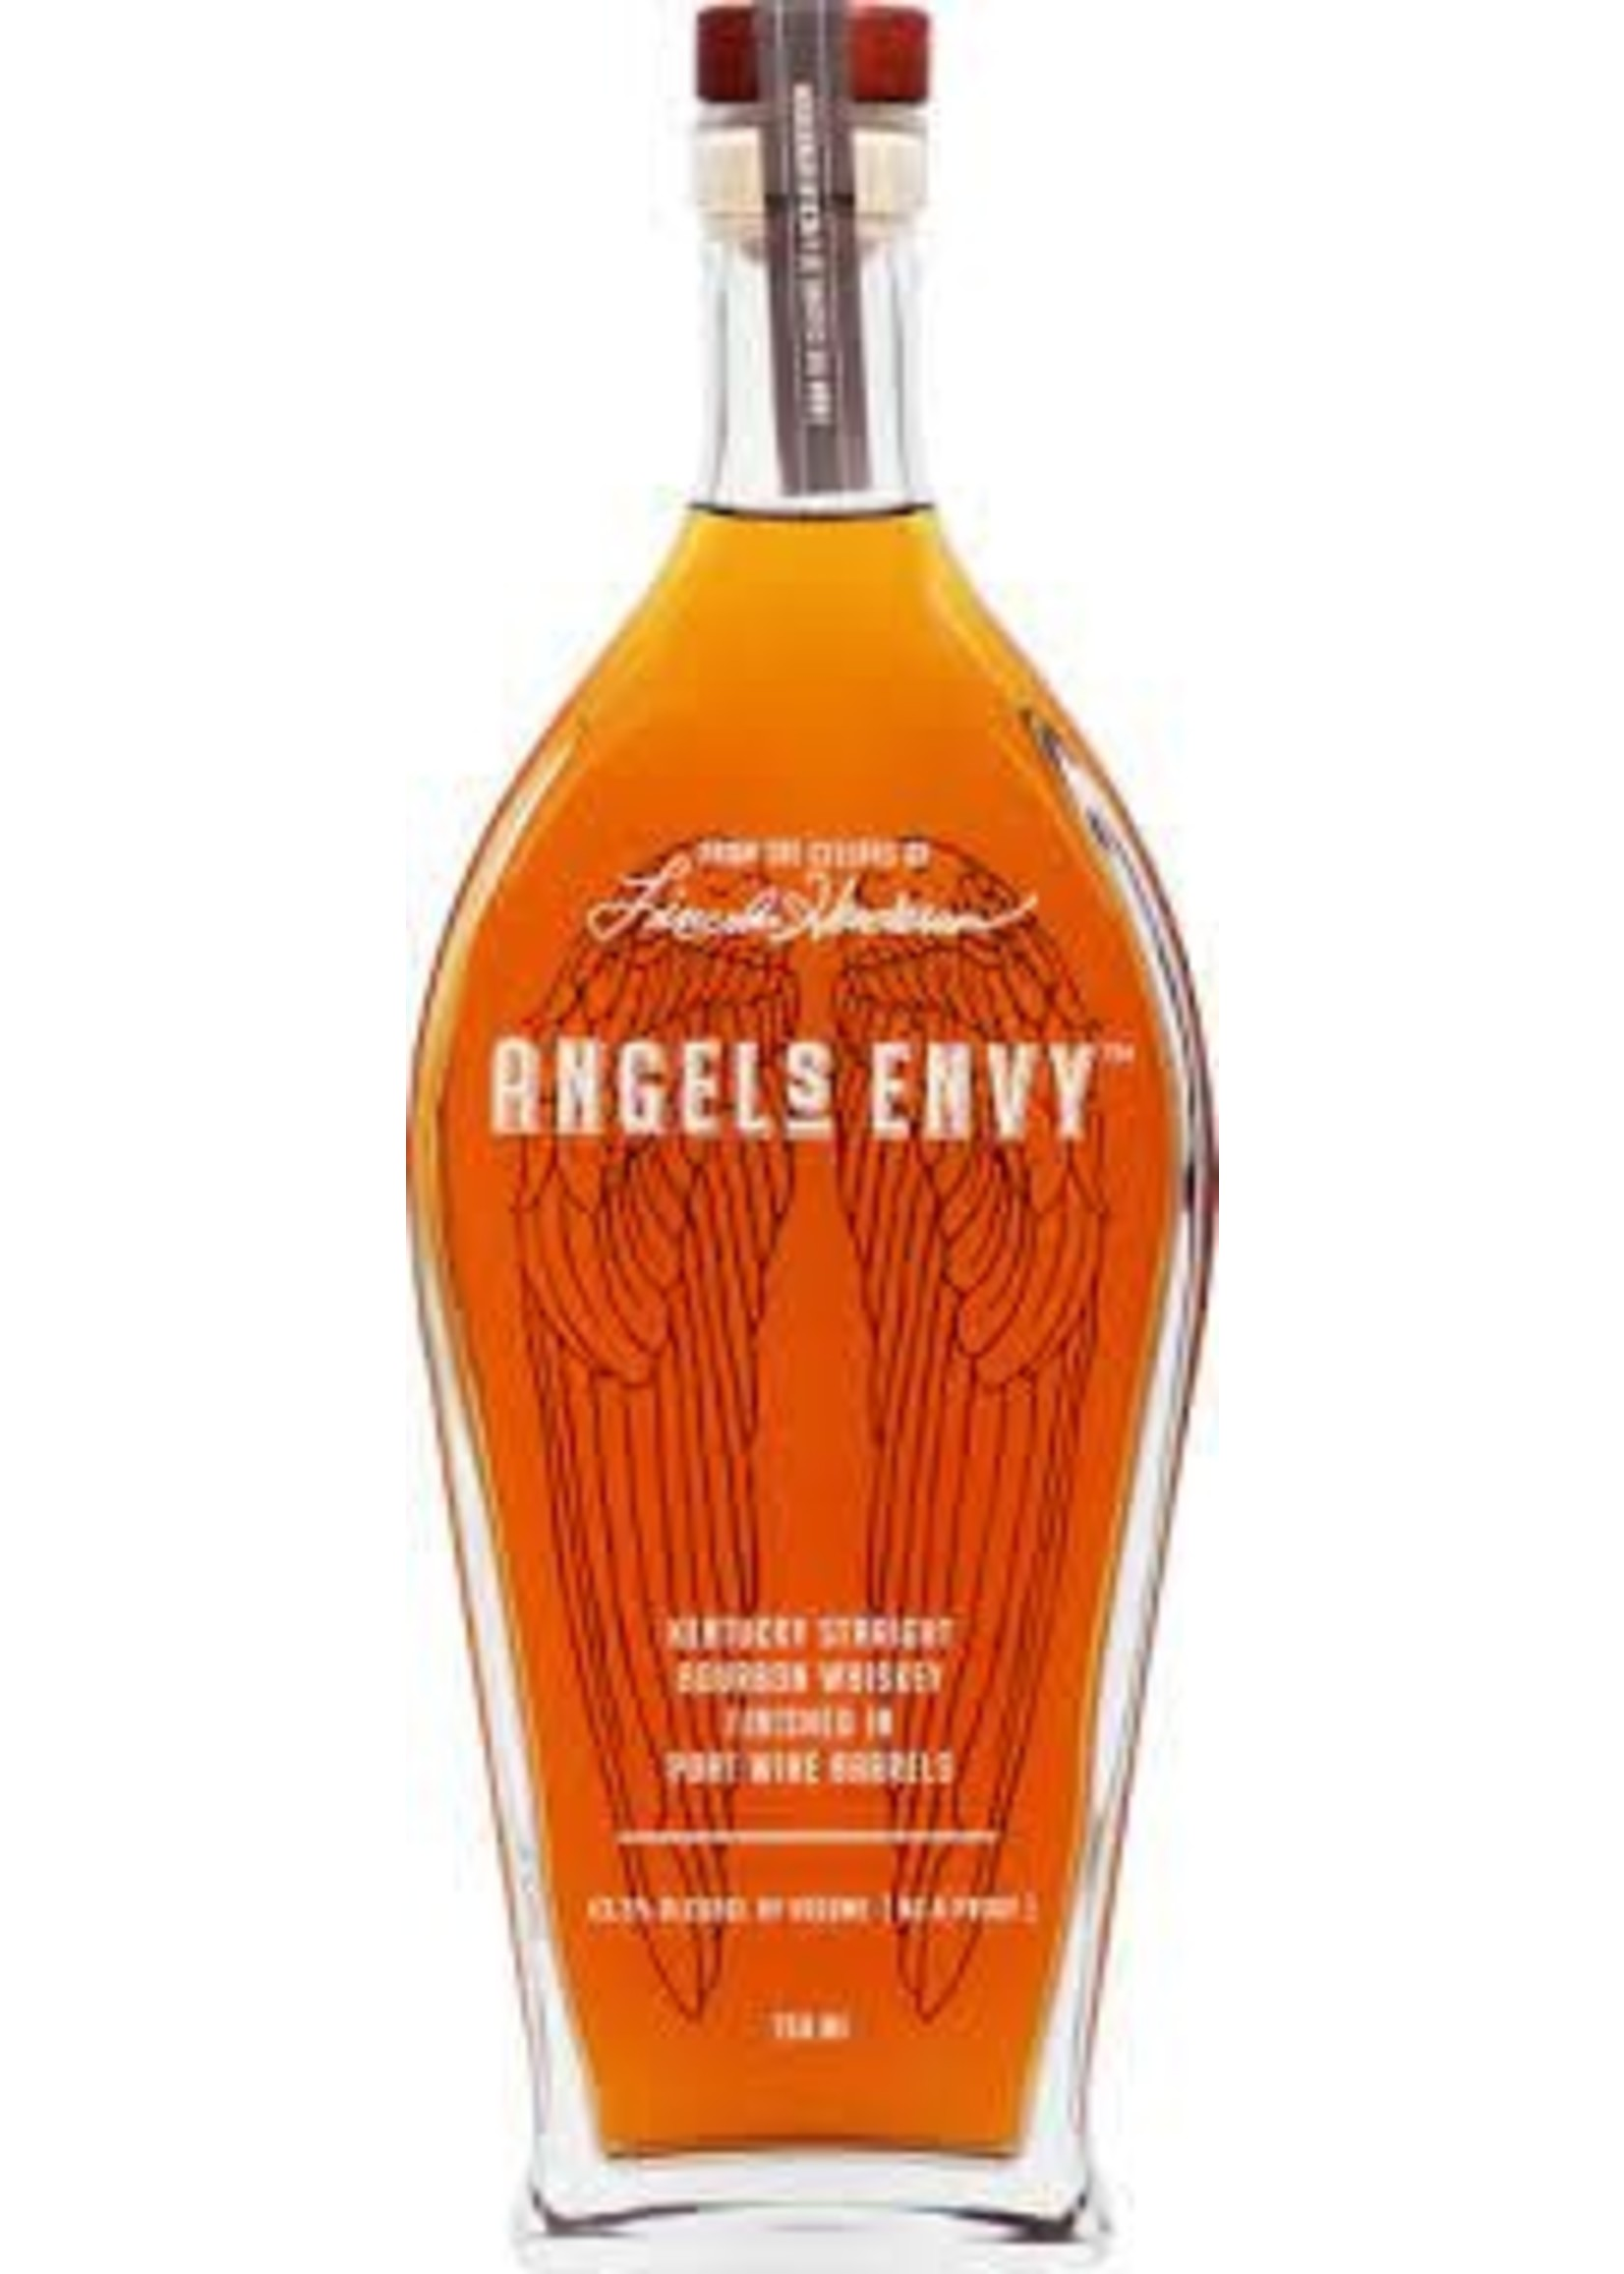 Angel's Envy Bourbon Finished in Port Wine Barrels 750ml